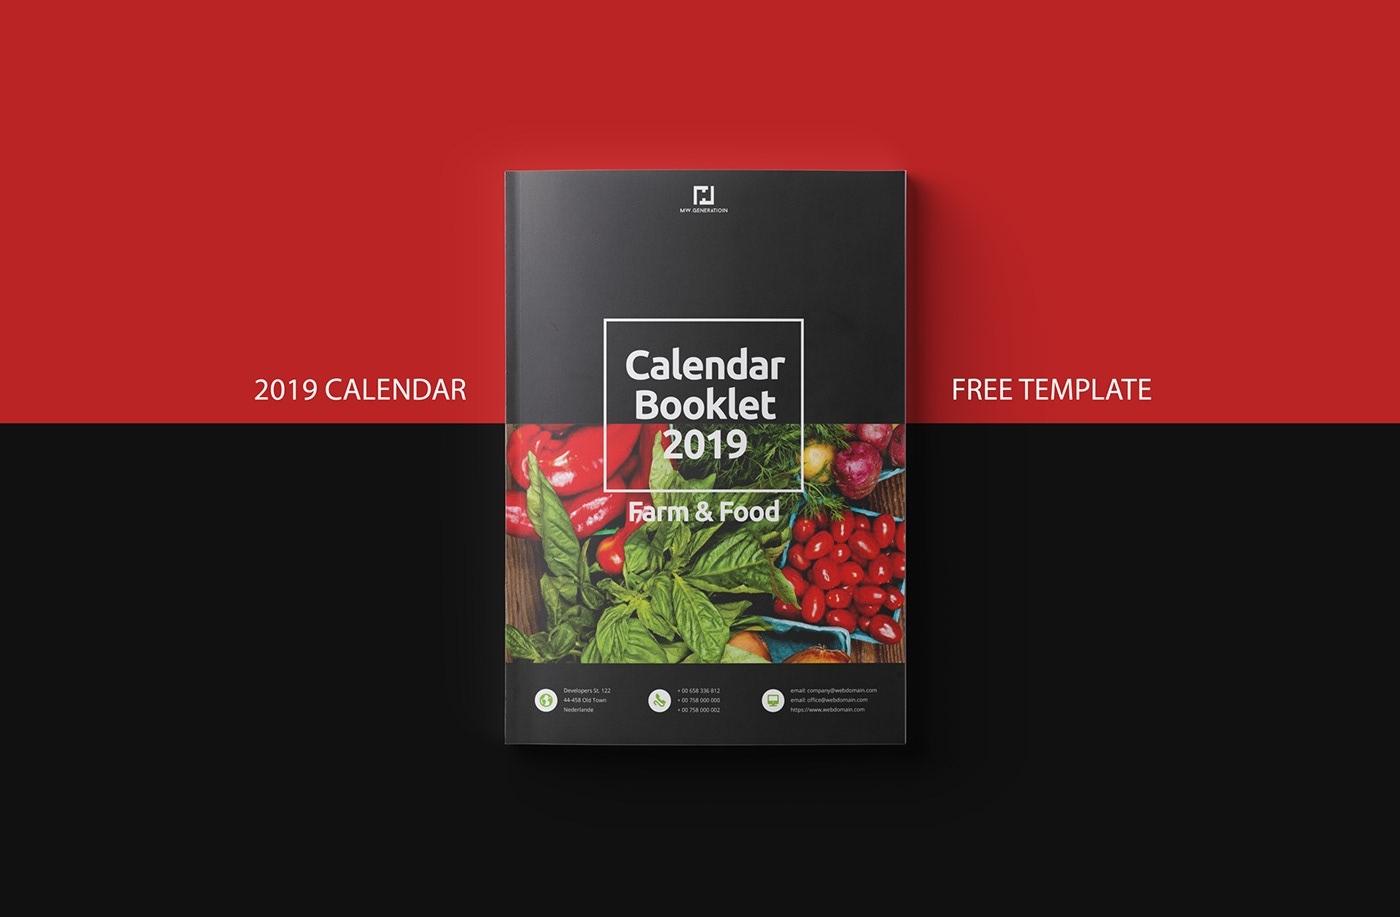 Free Calendar 2019 Indesign Template On Behance Free Calendar Template Indesign